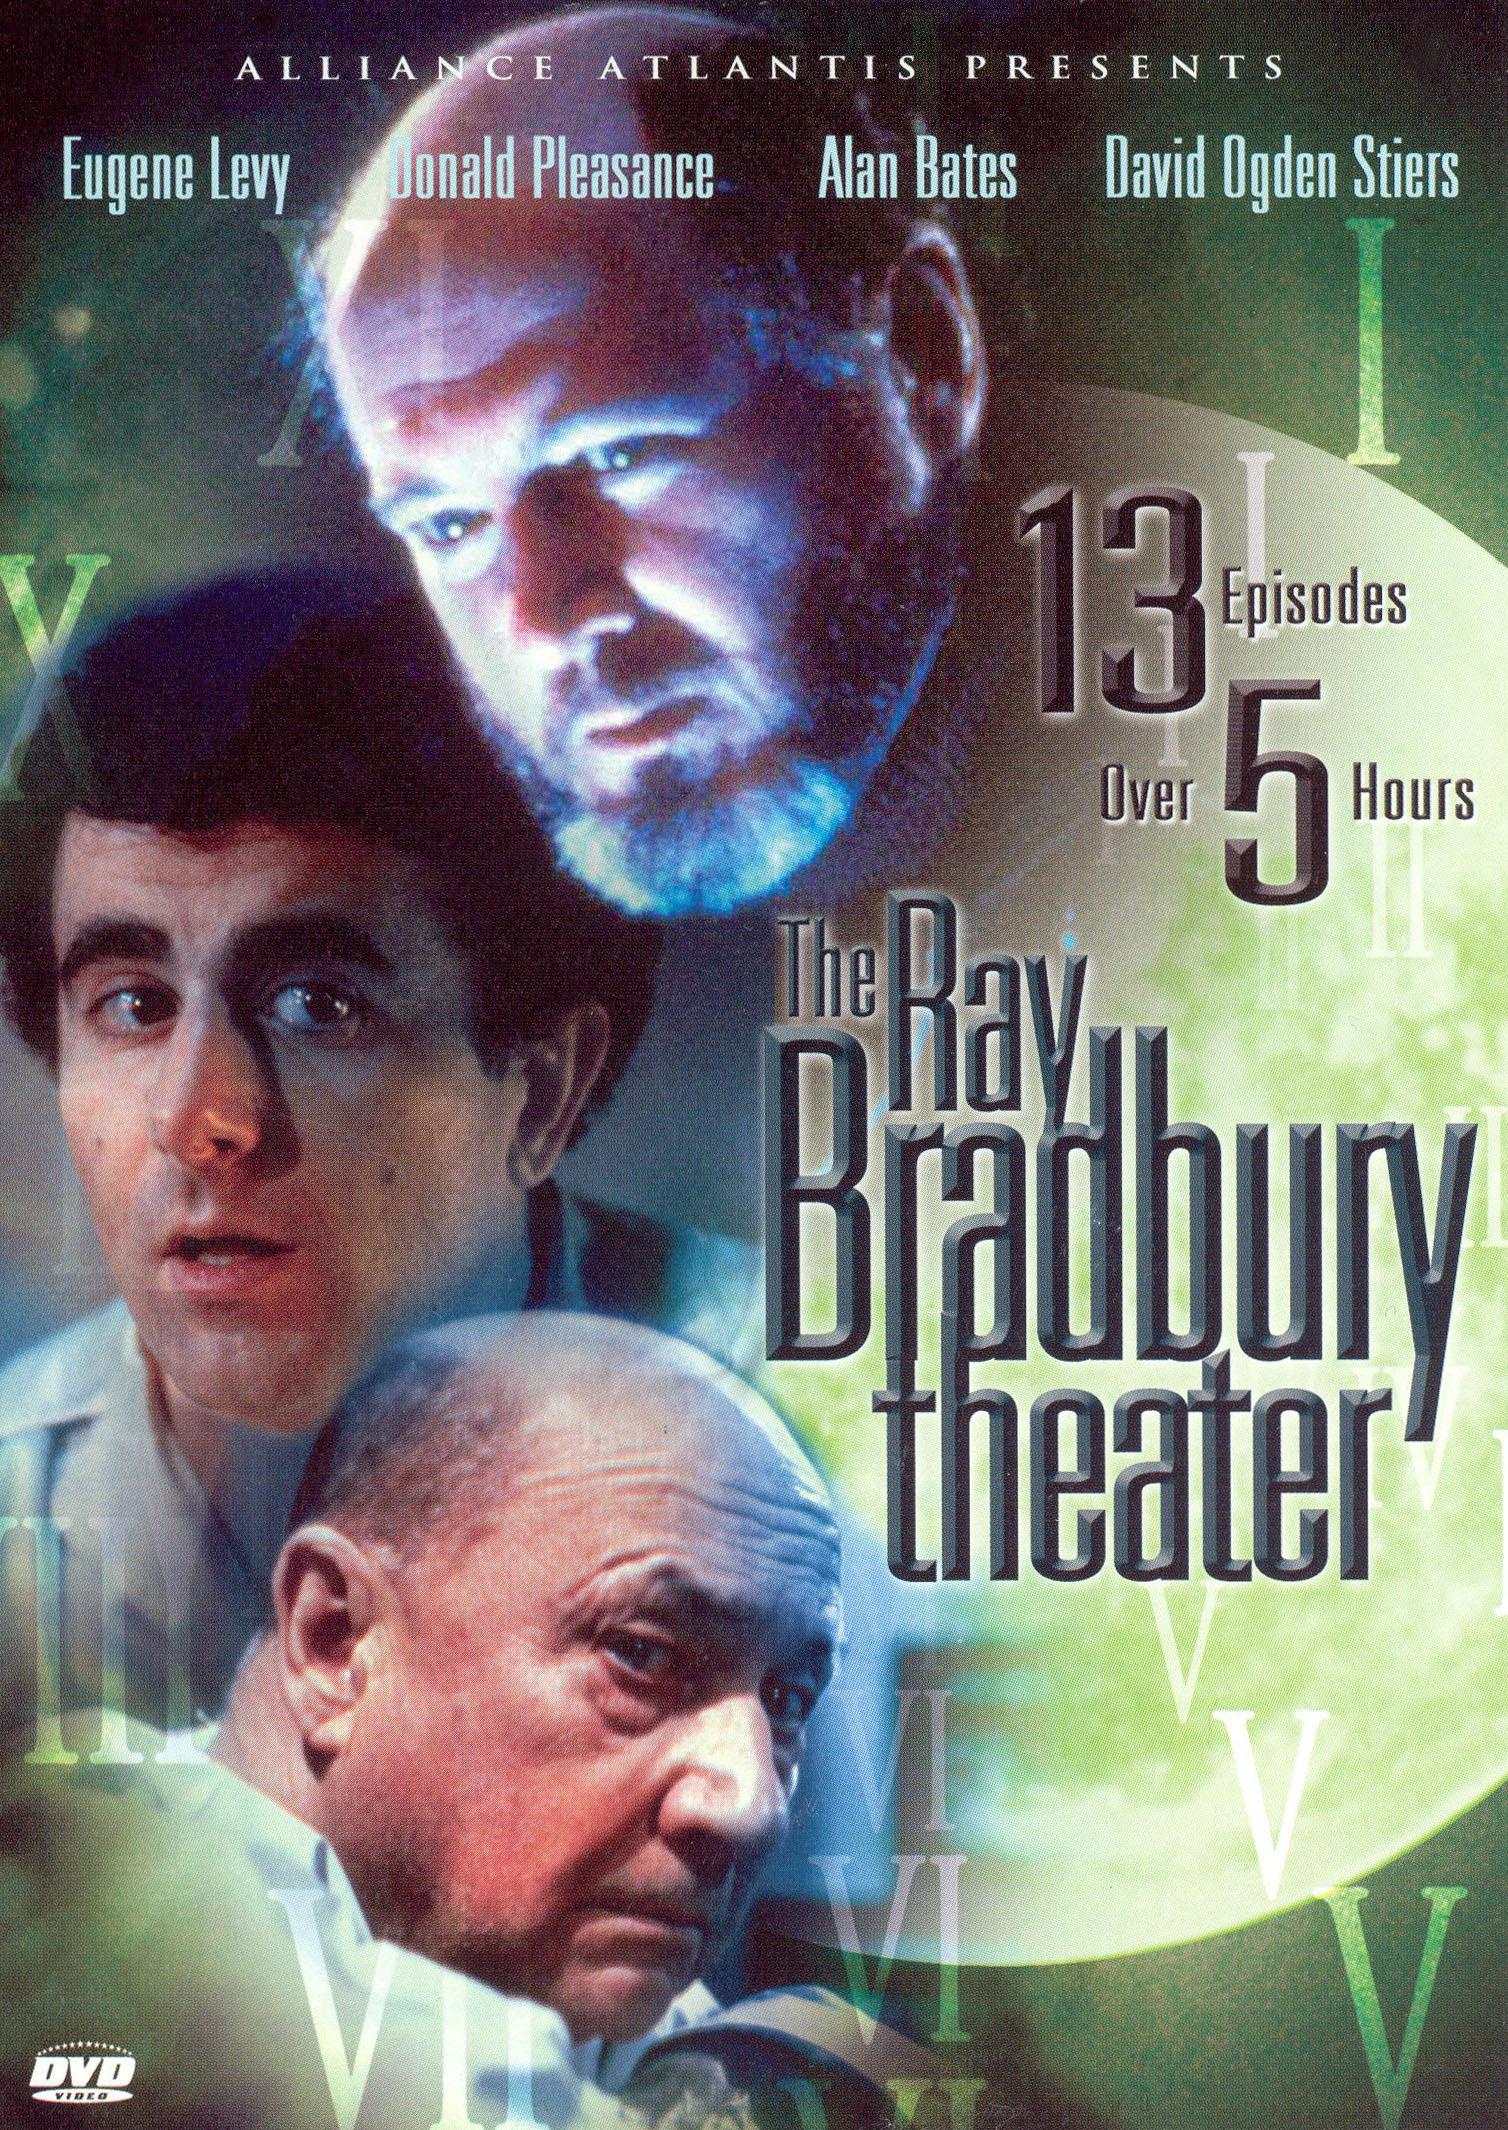 Ray Bradbury Theater, Vol. 2